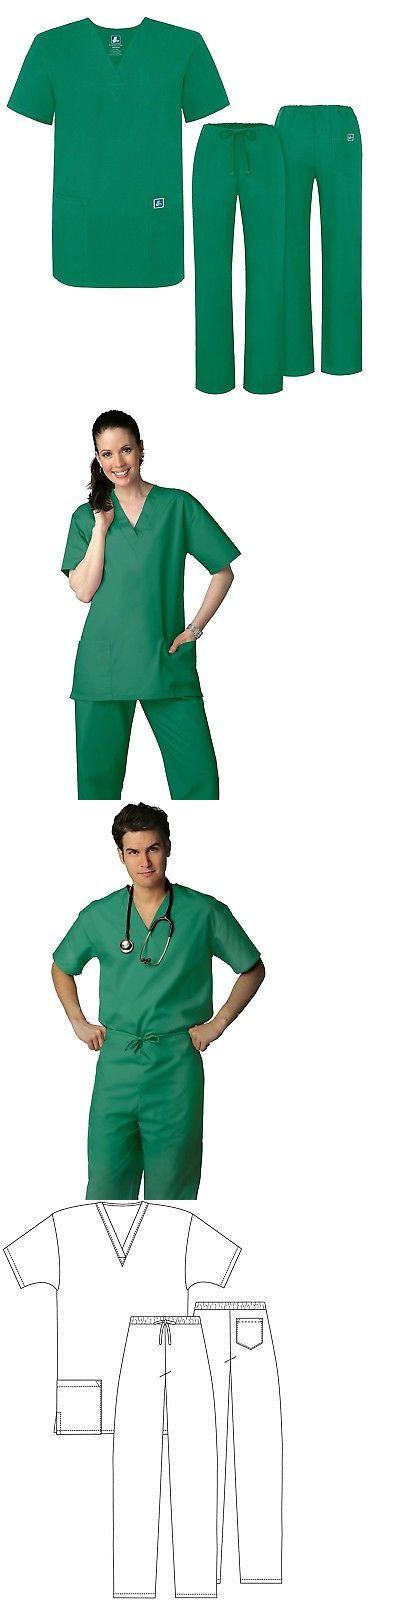 9ea264664b4 Sets 105432: Adar Universal Medical Scrubs Set Medical Uniforms - Unisex Fit  (45 Colors) -> BUY IT NOW ONLY: $13.19 on #eBay #universal #medical #scrubs  ...